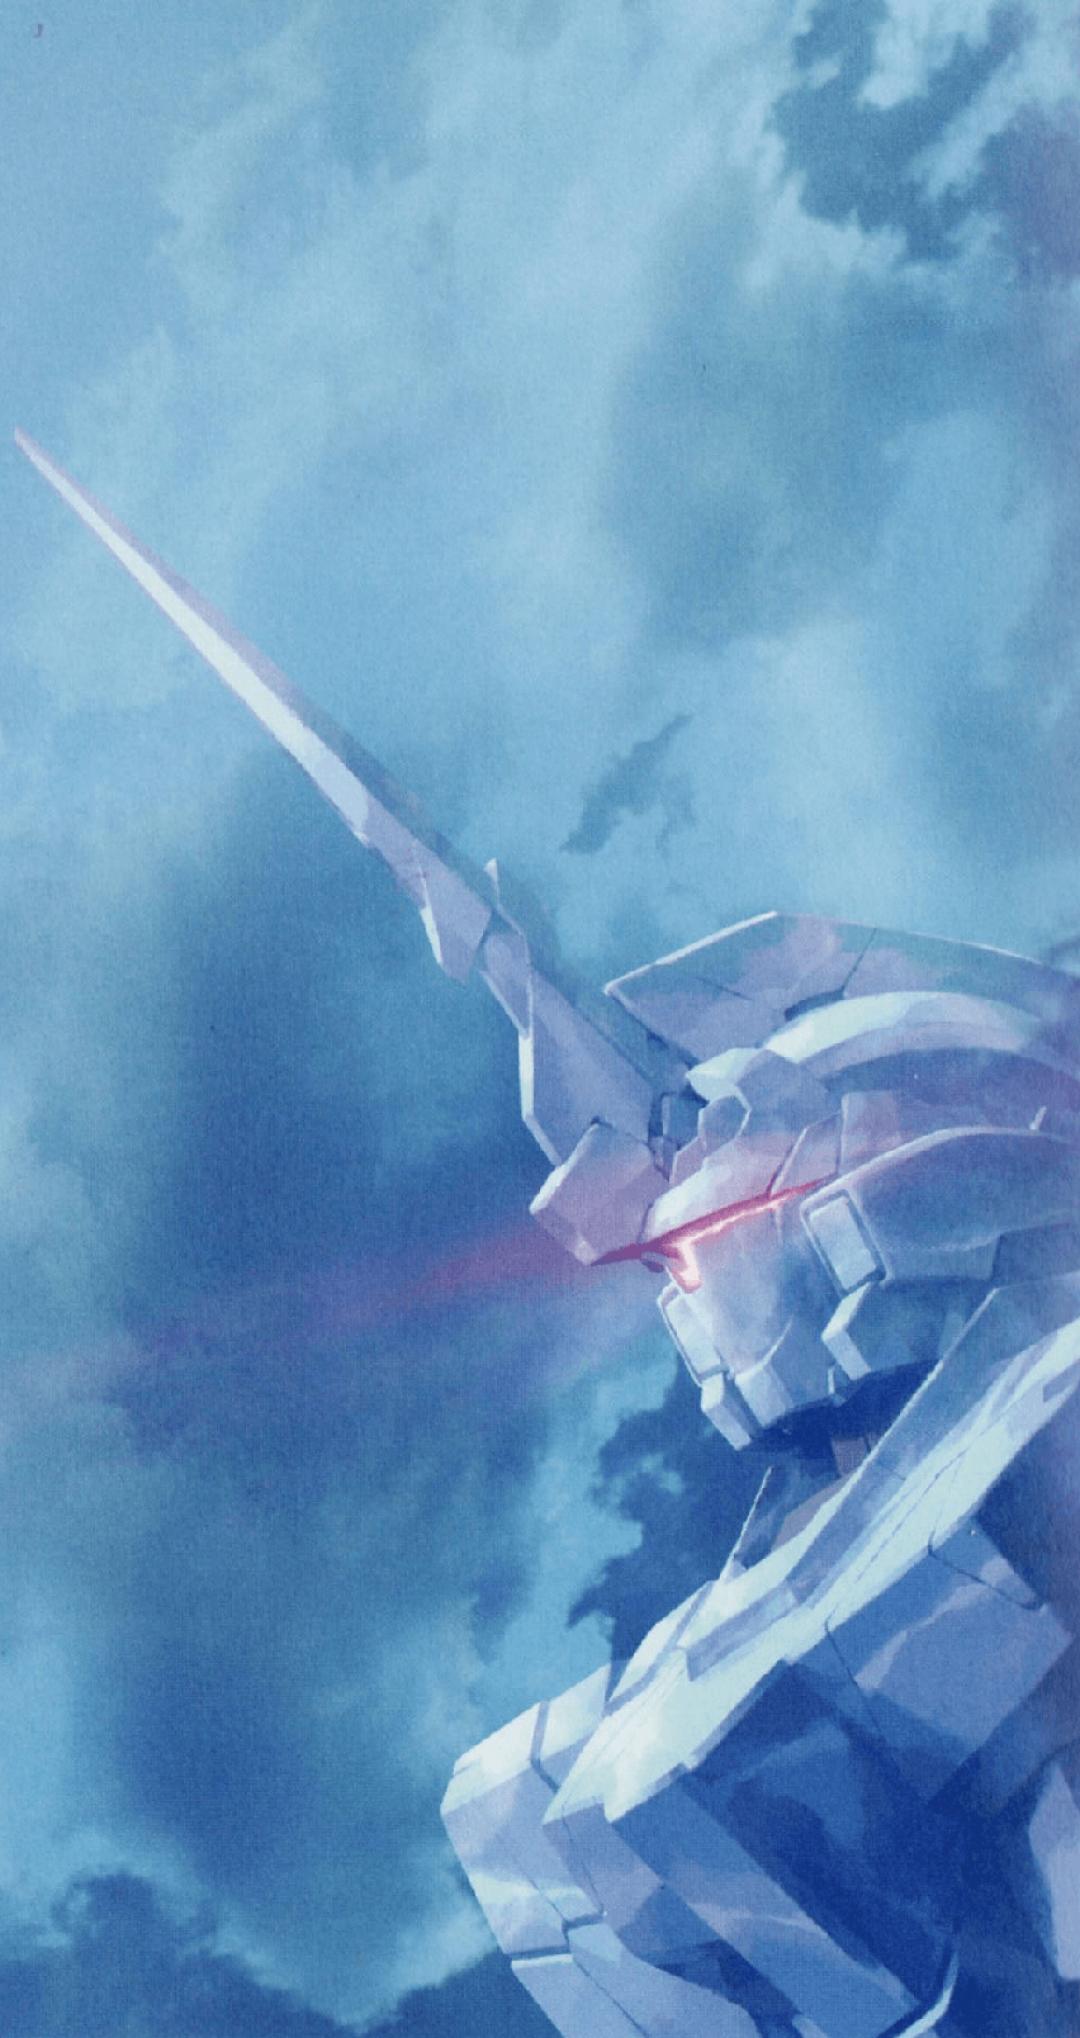 Gundam Android Iphone Desktop Hd Backgrounds Wallpapers 1080p 4k 120628 Hdwallpapers Androidwallpapers Iphon Gundam Art Gundam Gundam Wallpapers